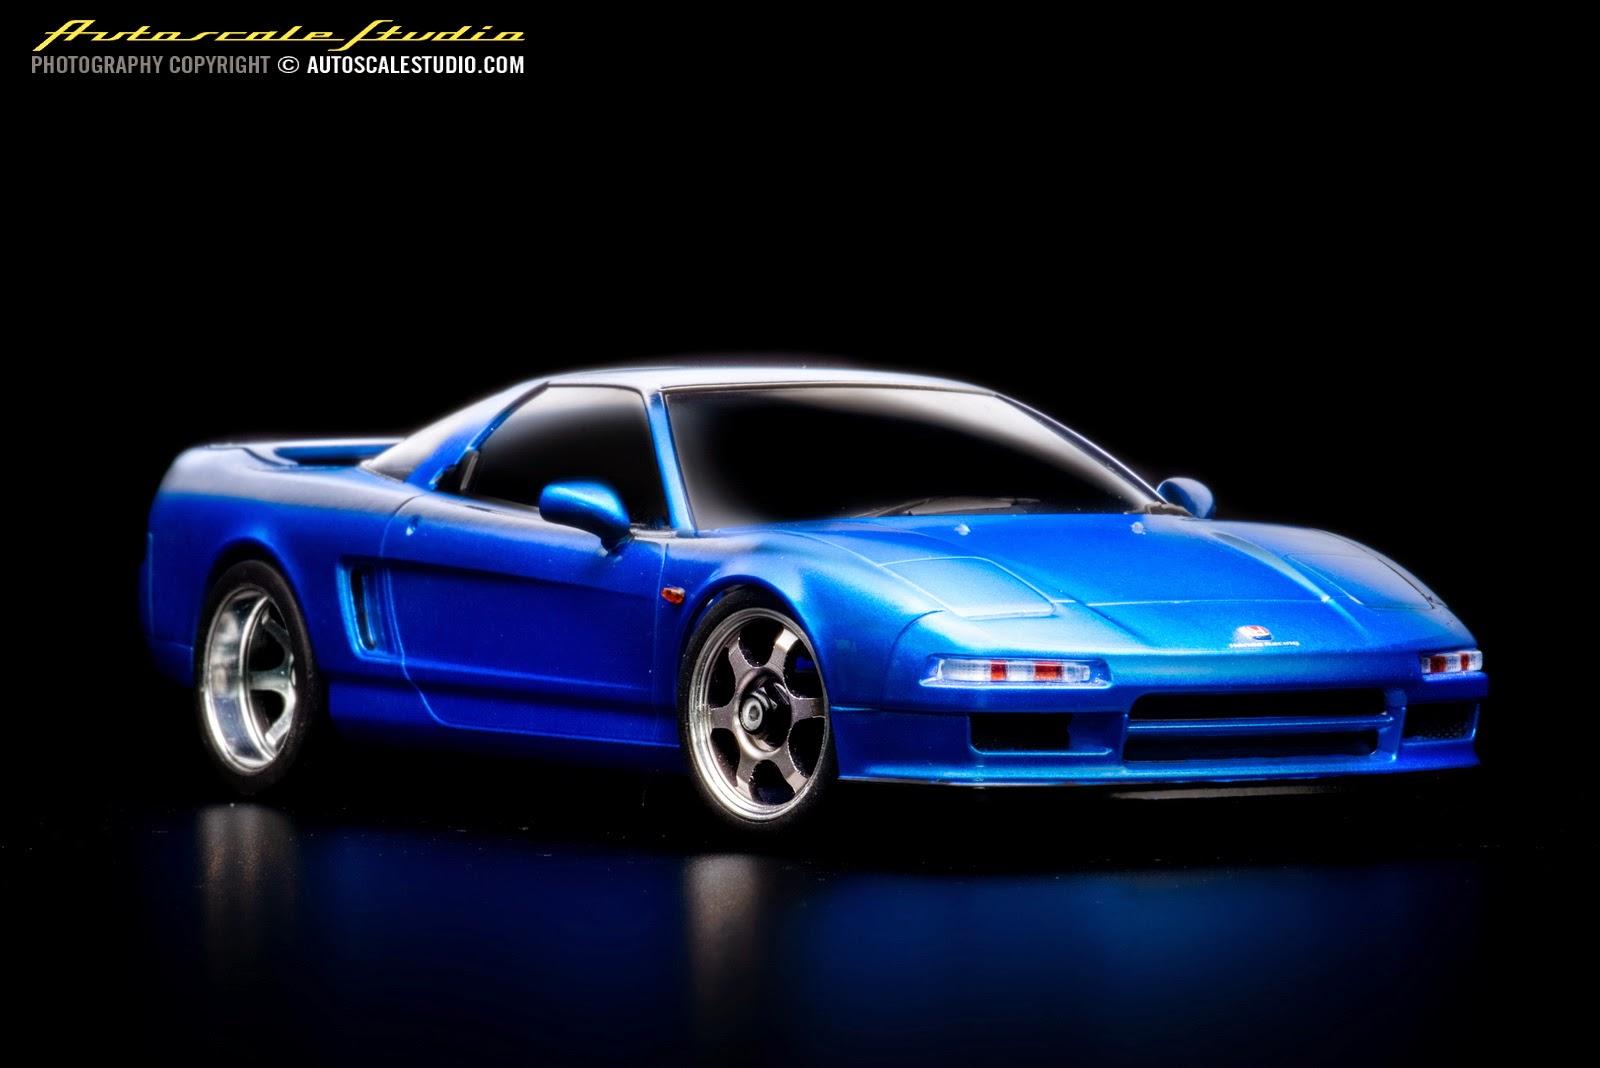 Mzp131mb honda nsx type r metallic blue